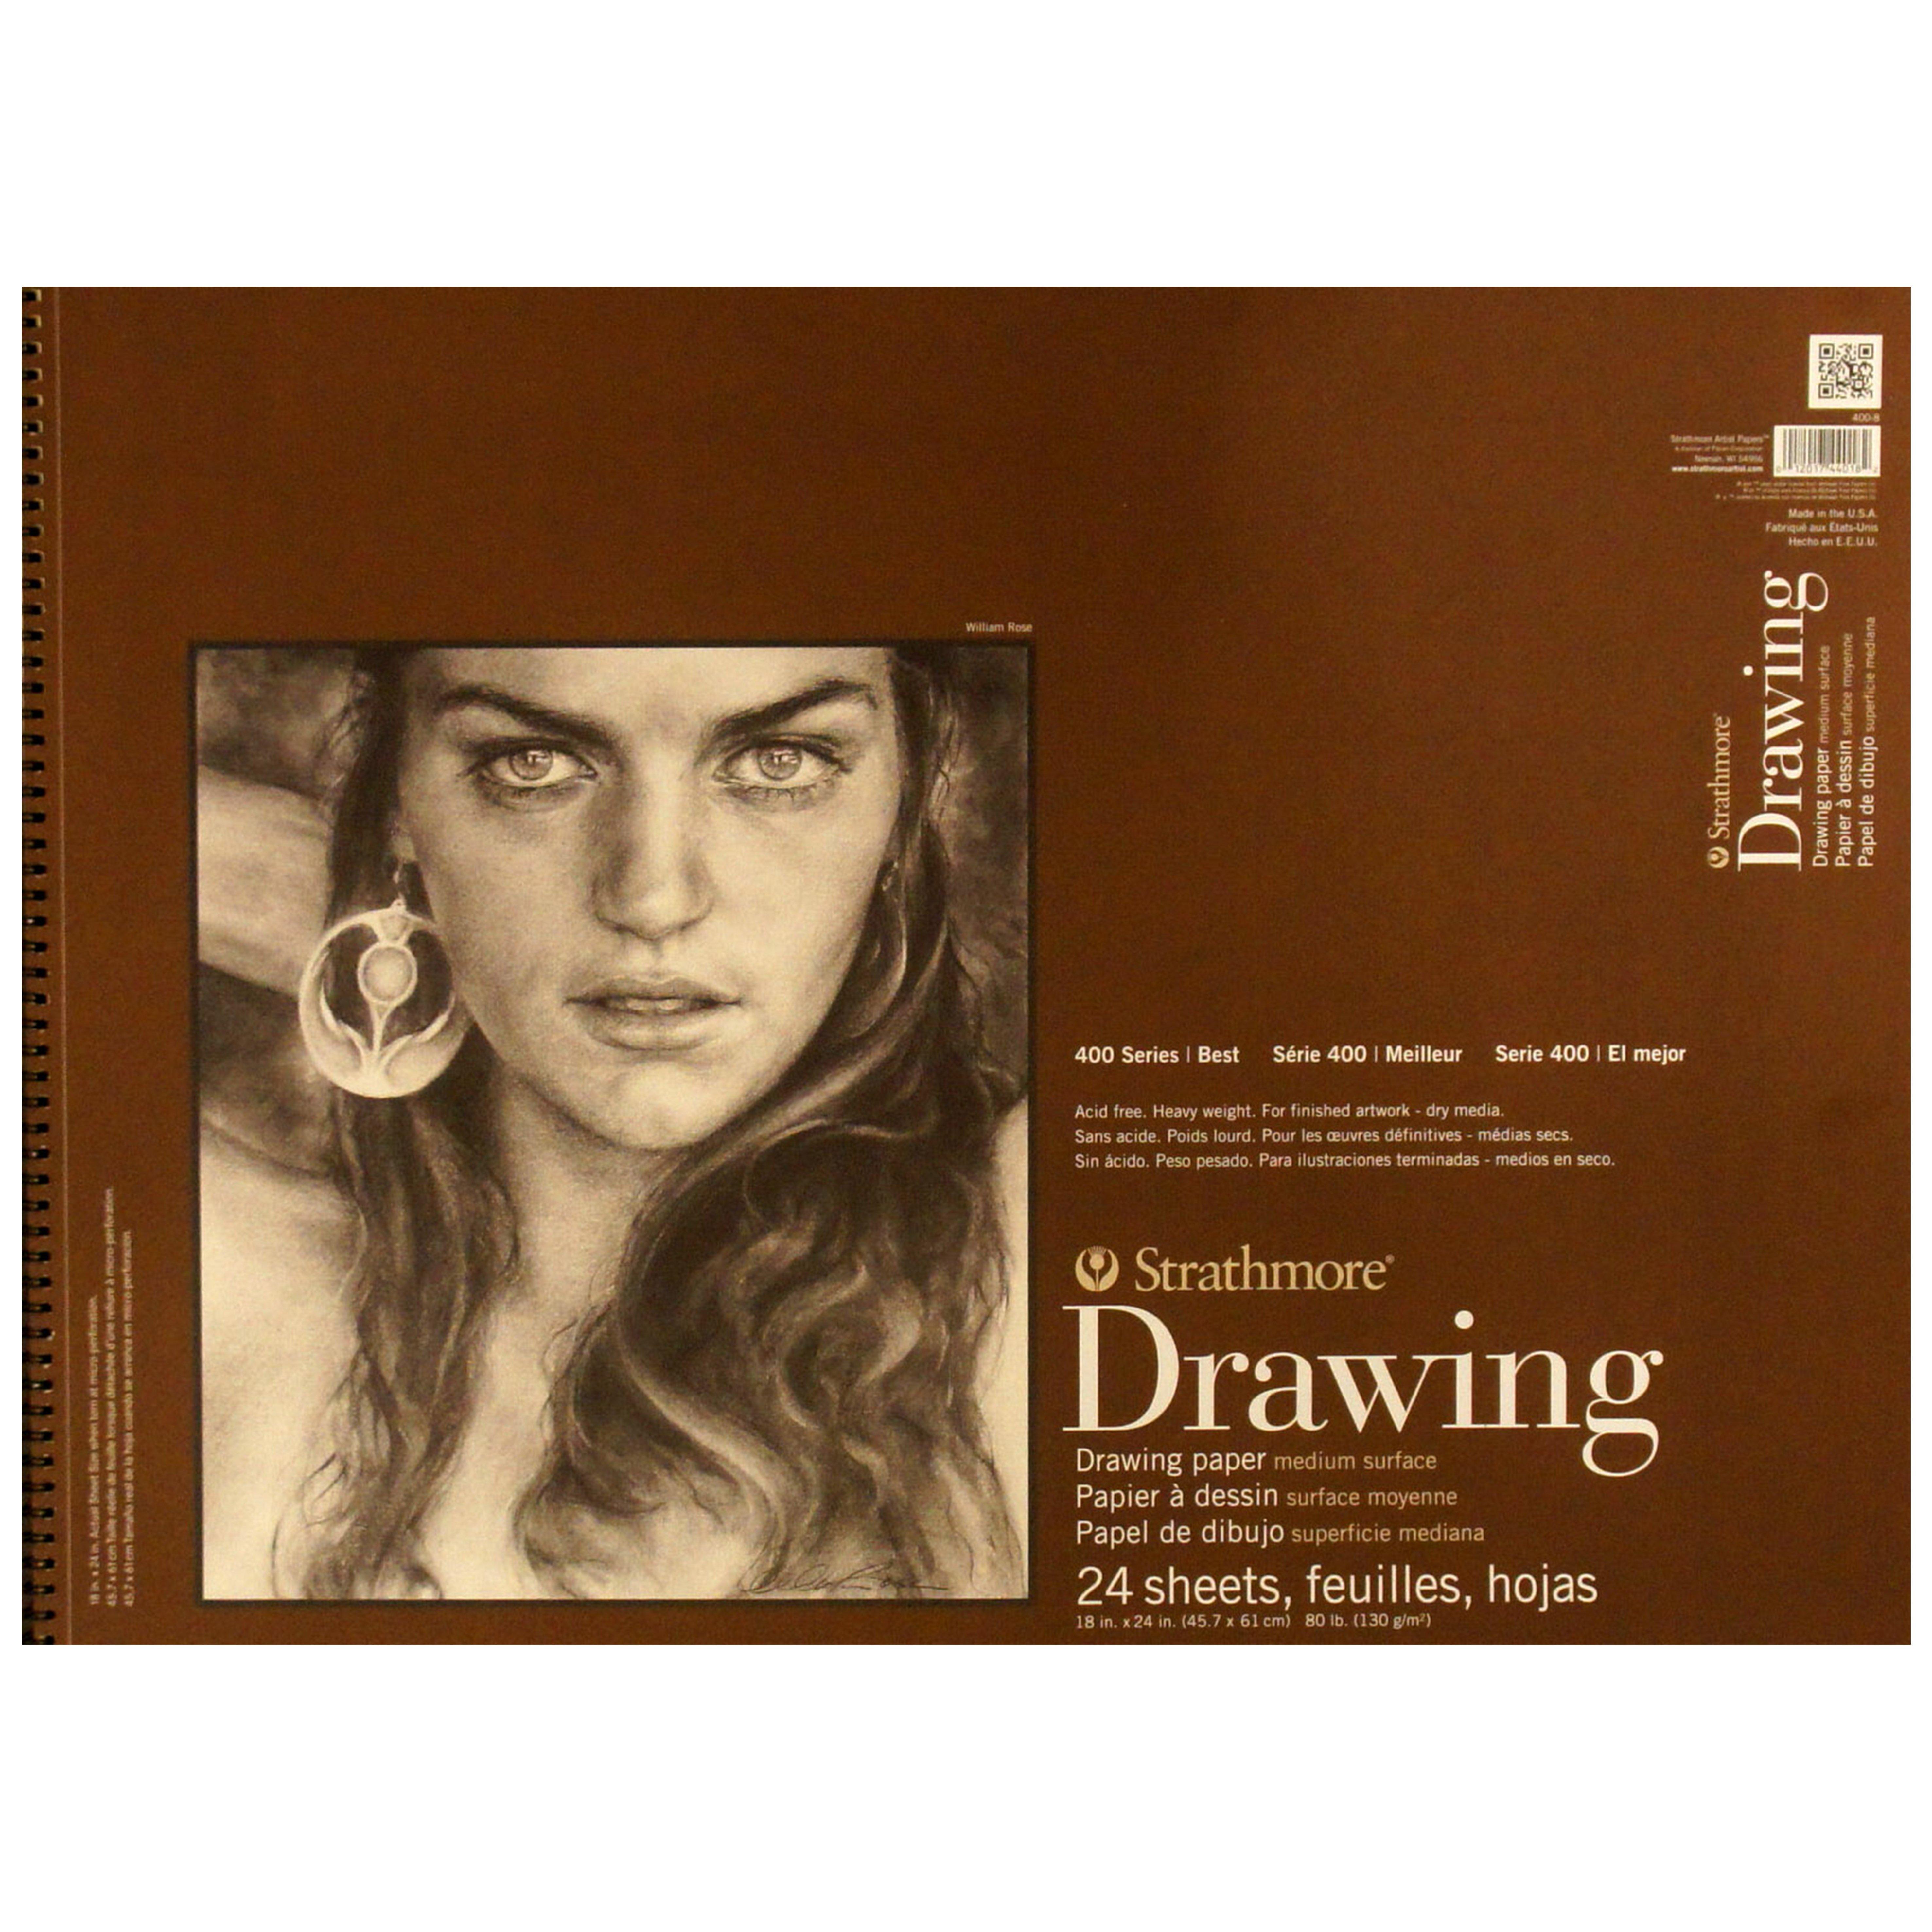 Strathmore Series 400 Drawing Paper 18x24 24 Sheets (Medium)